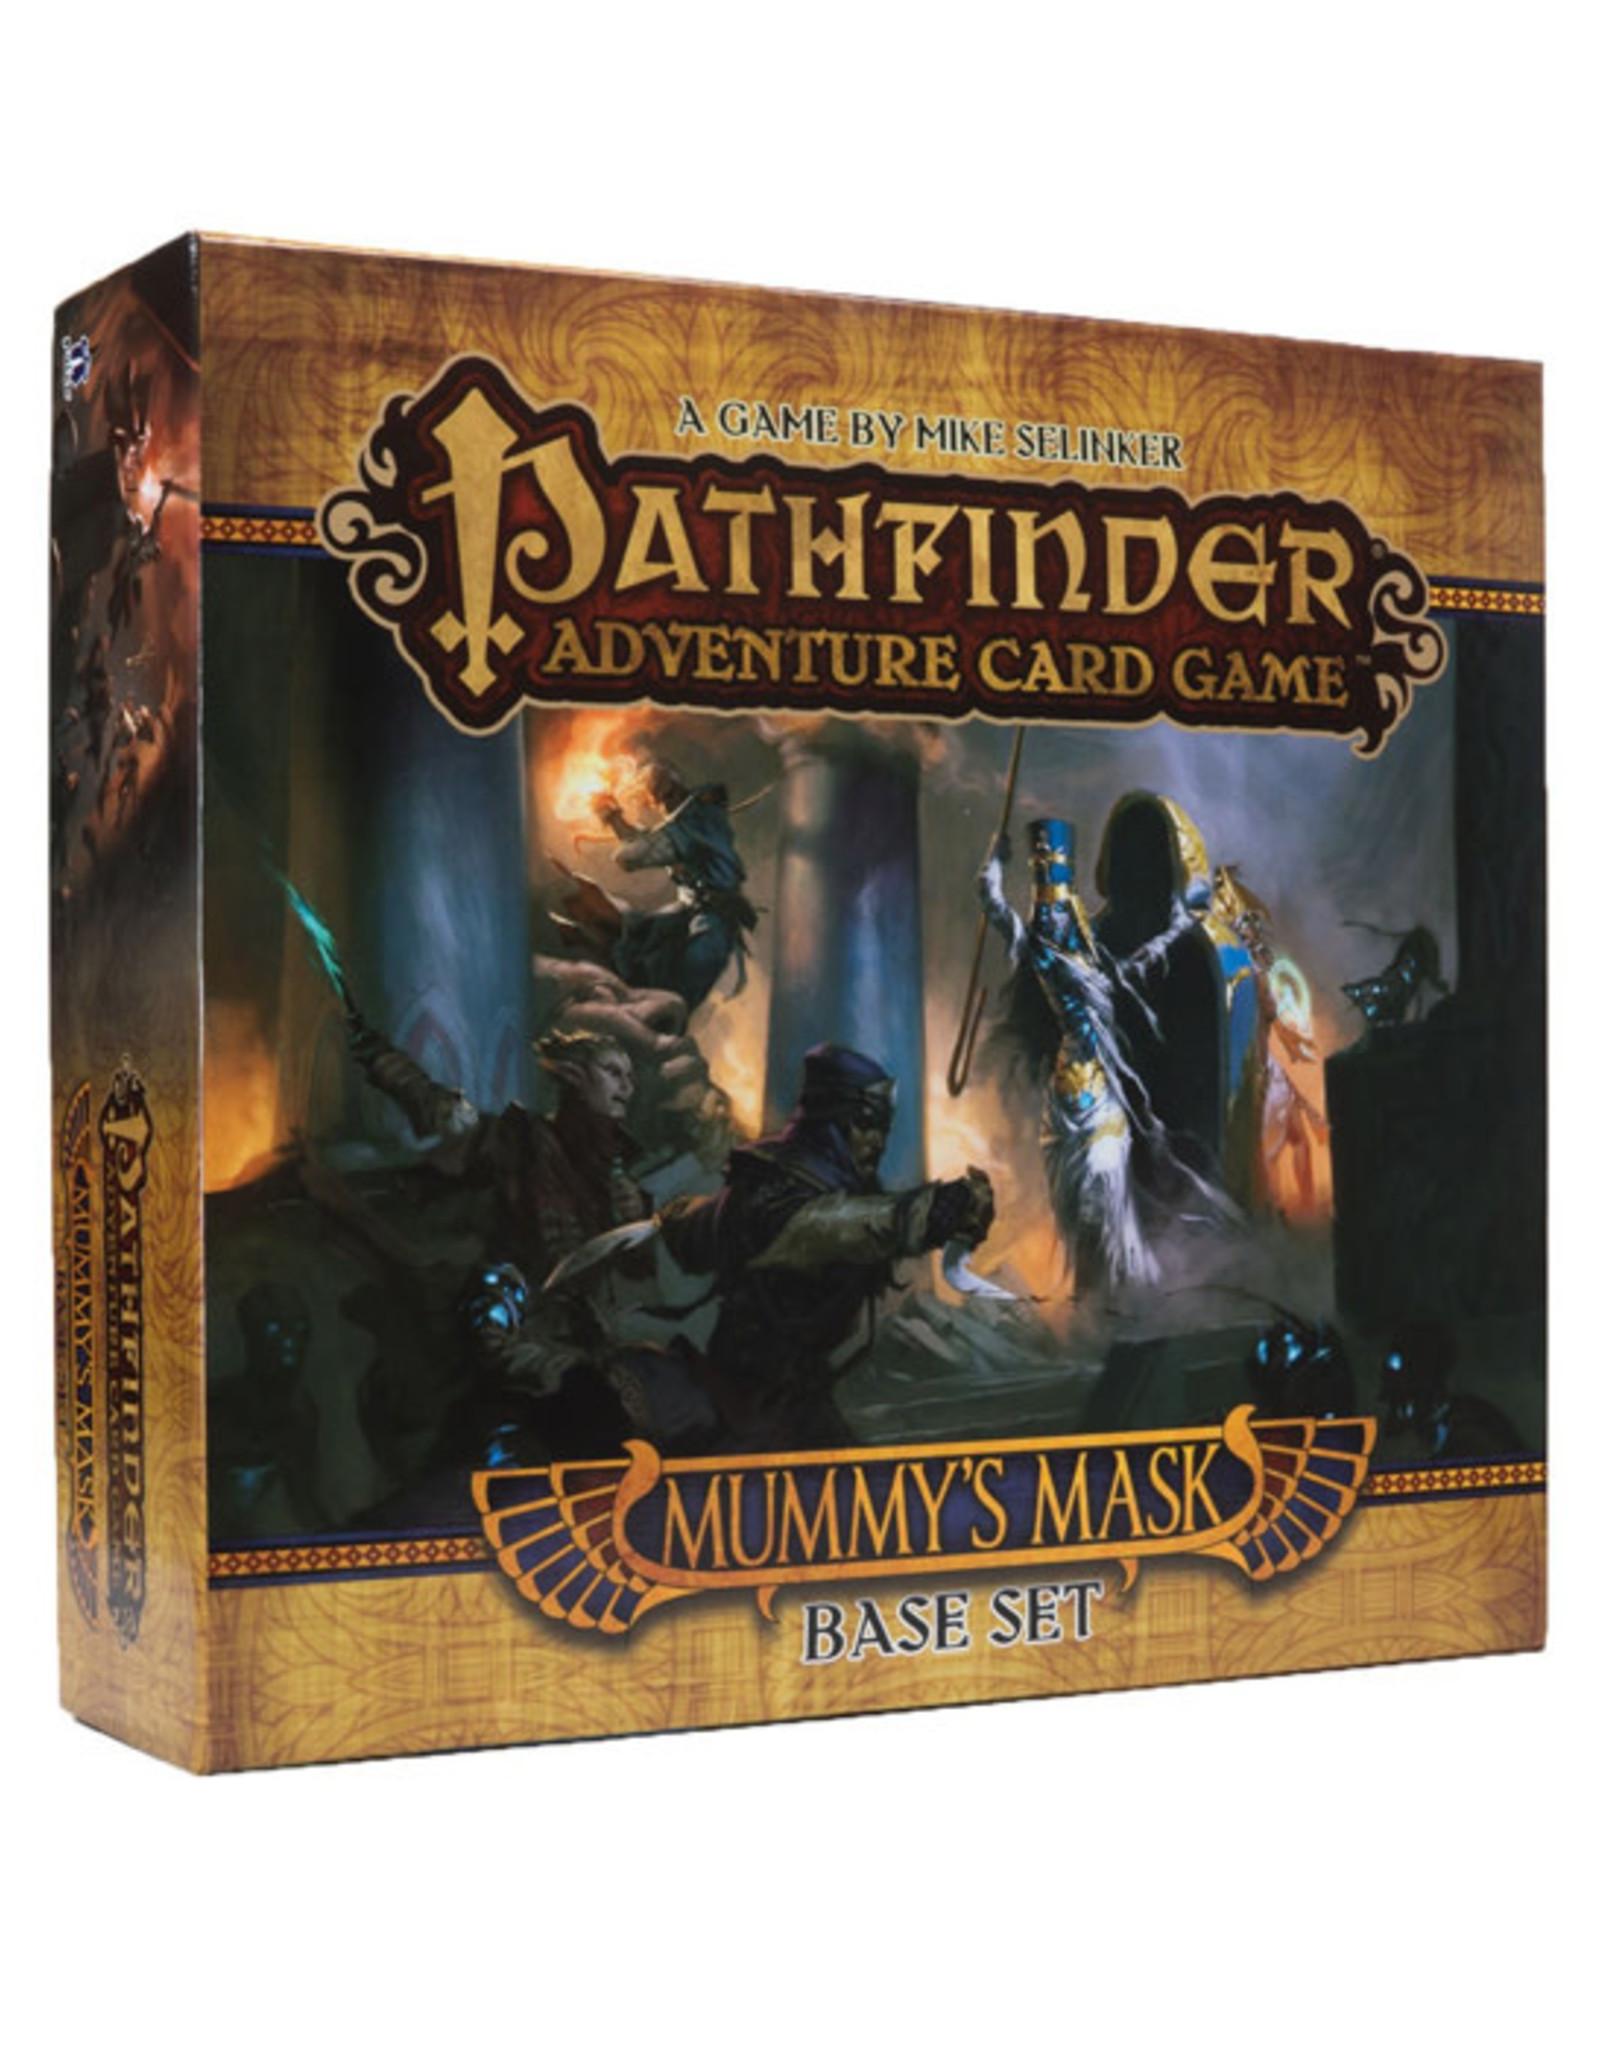 Pathfinder Pathfinder: Adventure Card Game - Mummy's Mask - Base Set